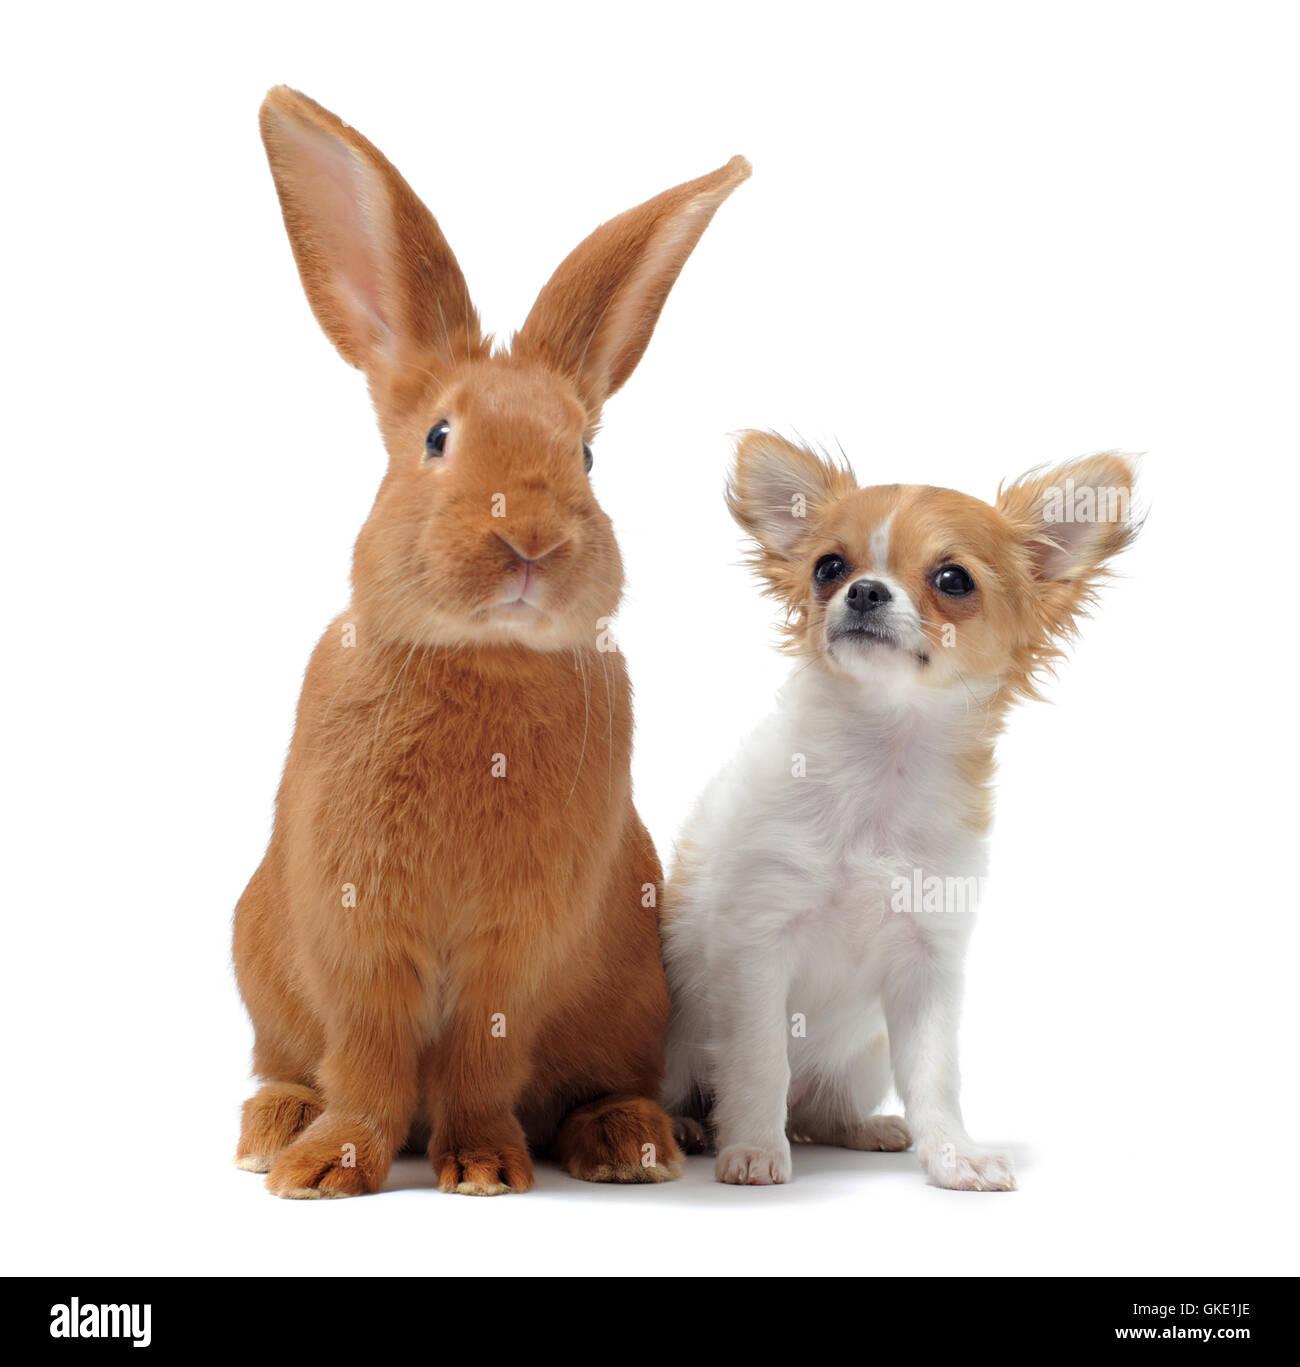 dog rabbit puppy - Stock Image